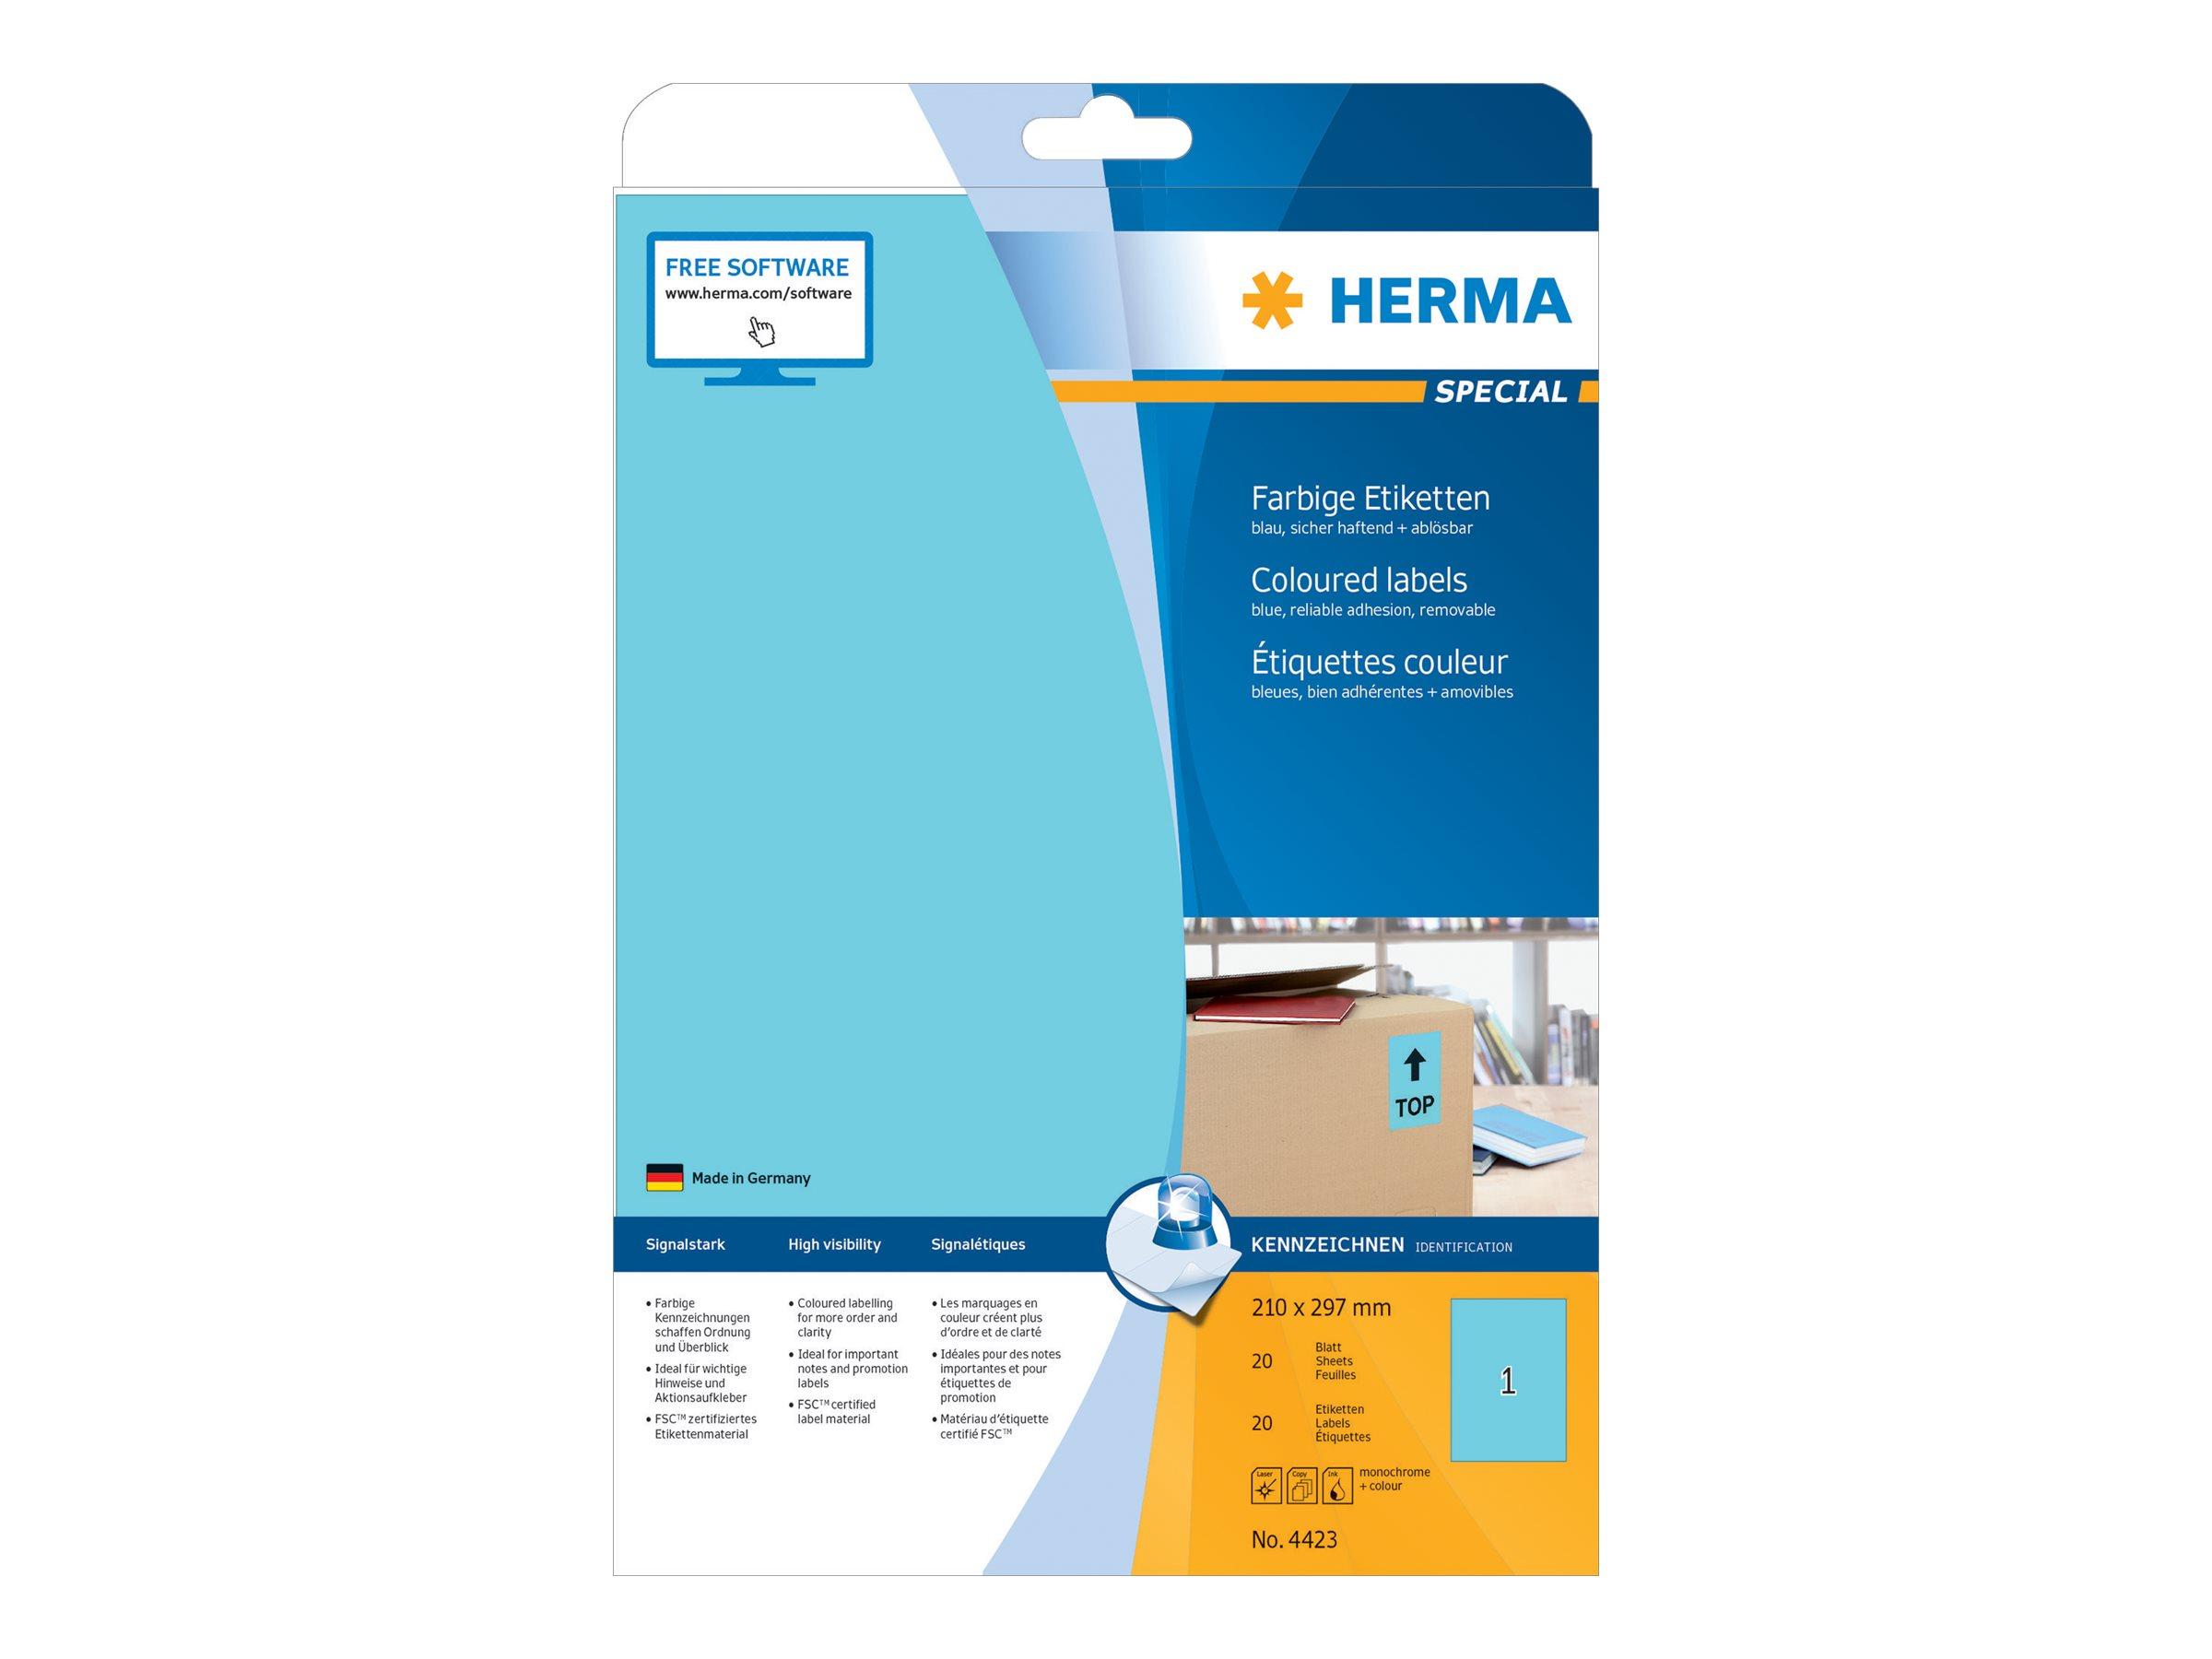 HERMA Special - Papier - matt - permanent selbstklebend - Blau - A4 (210 x 297 mm)